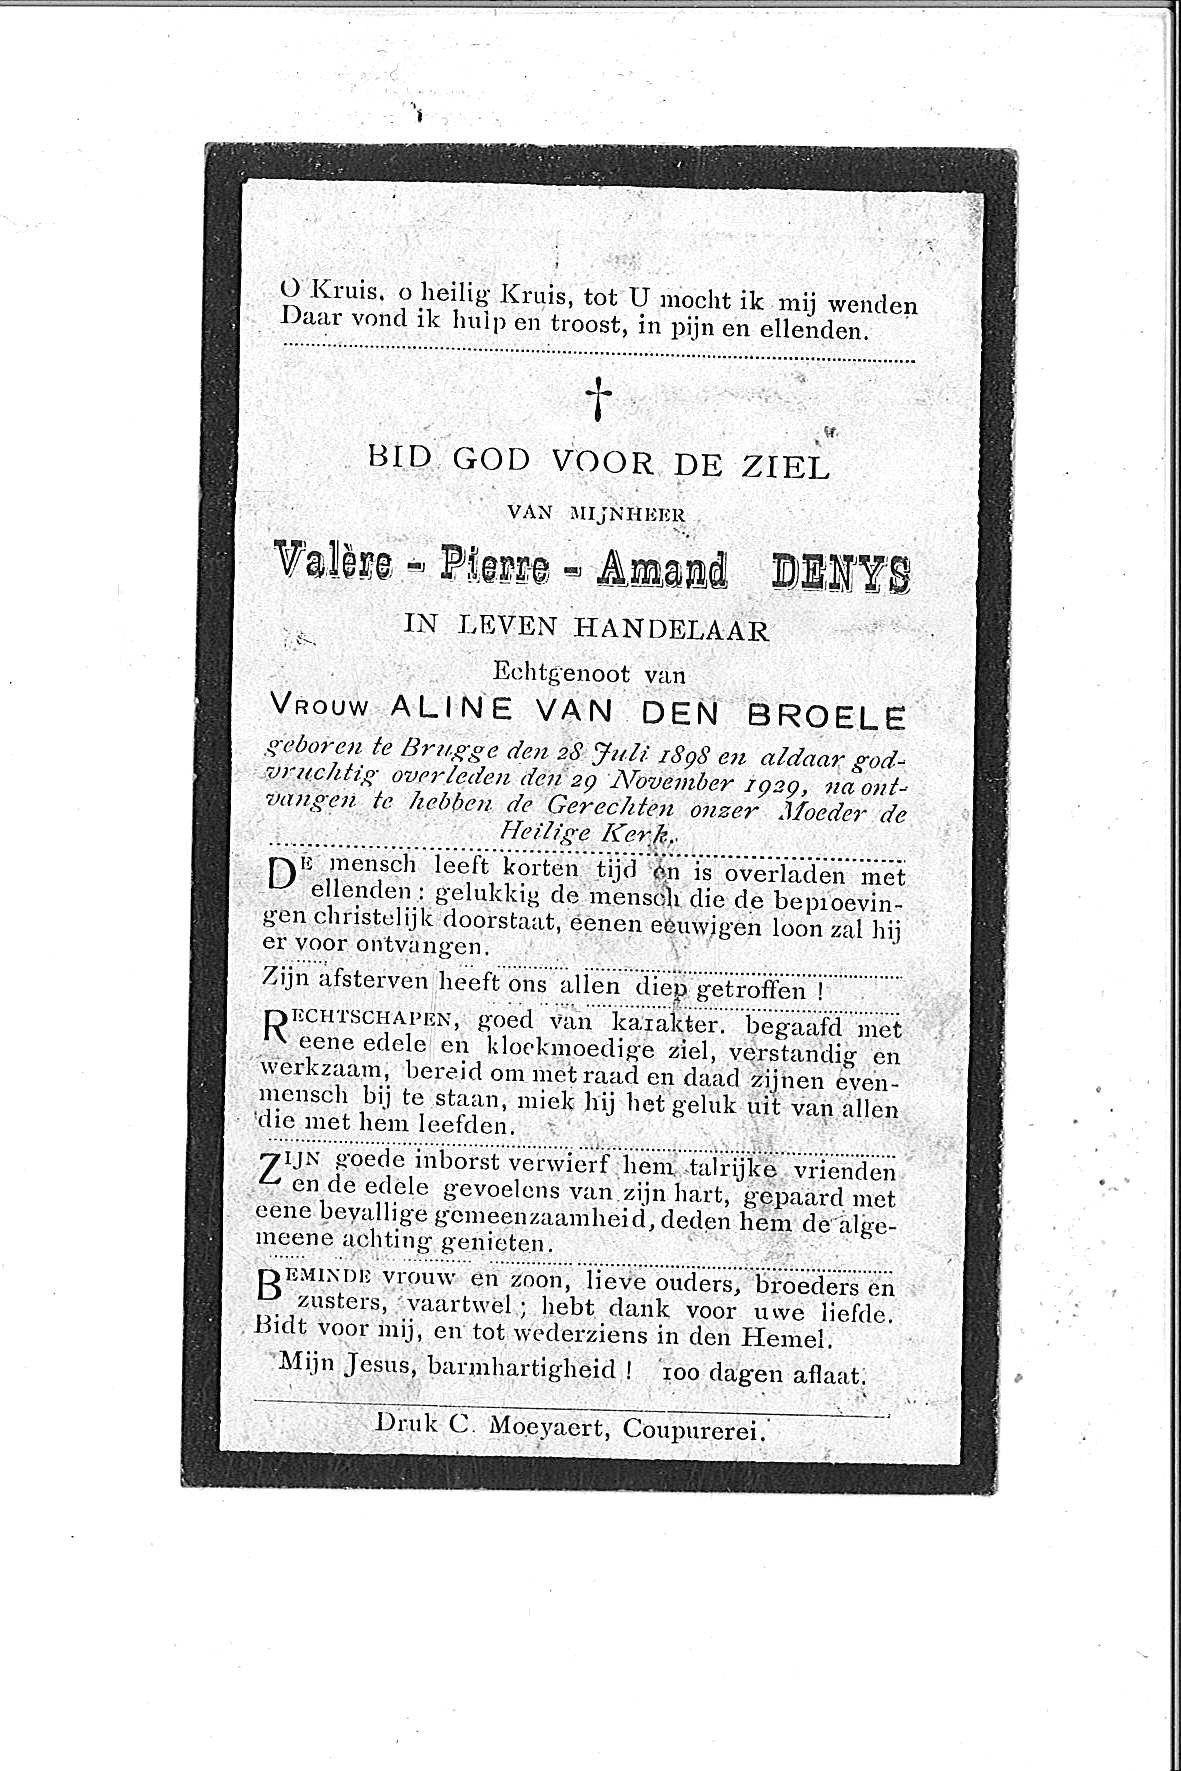 Valere-Pierre-Amand(1929)20150415130638_00055.jpg